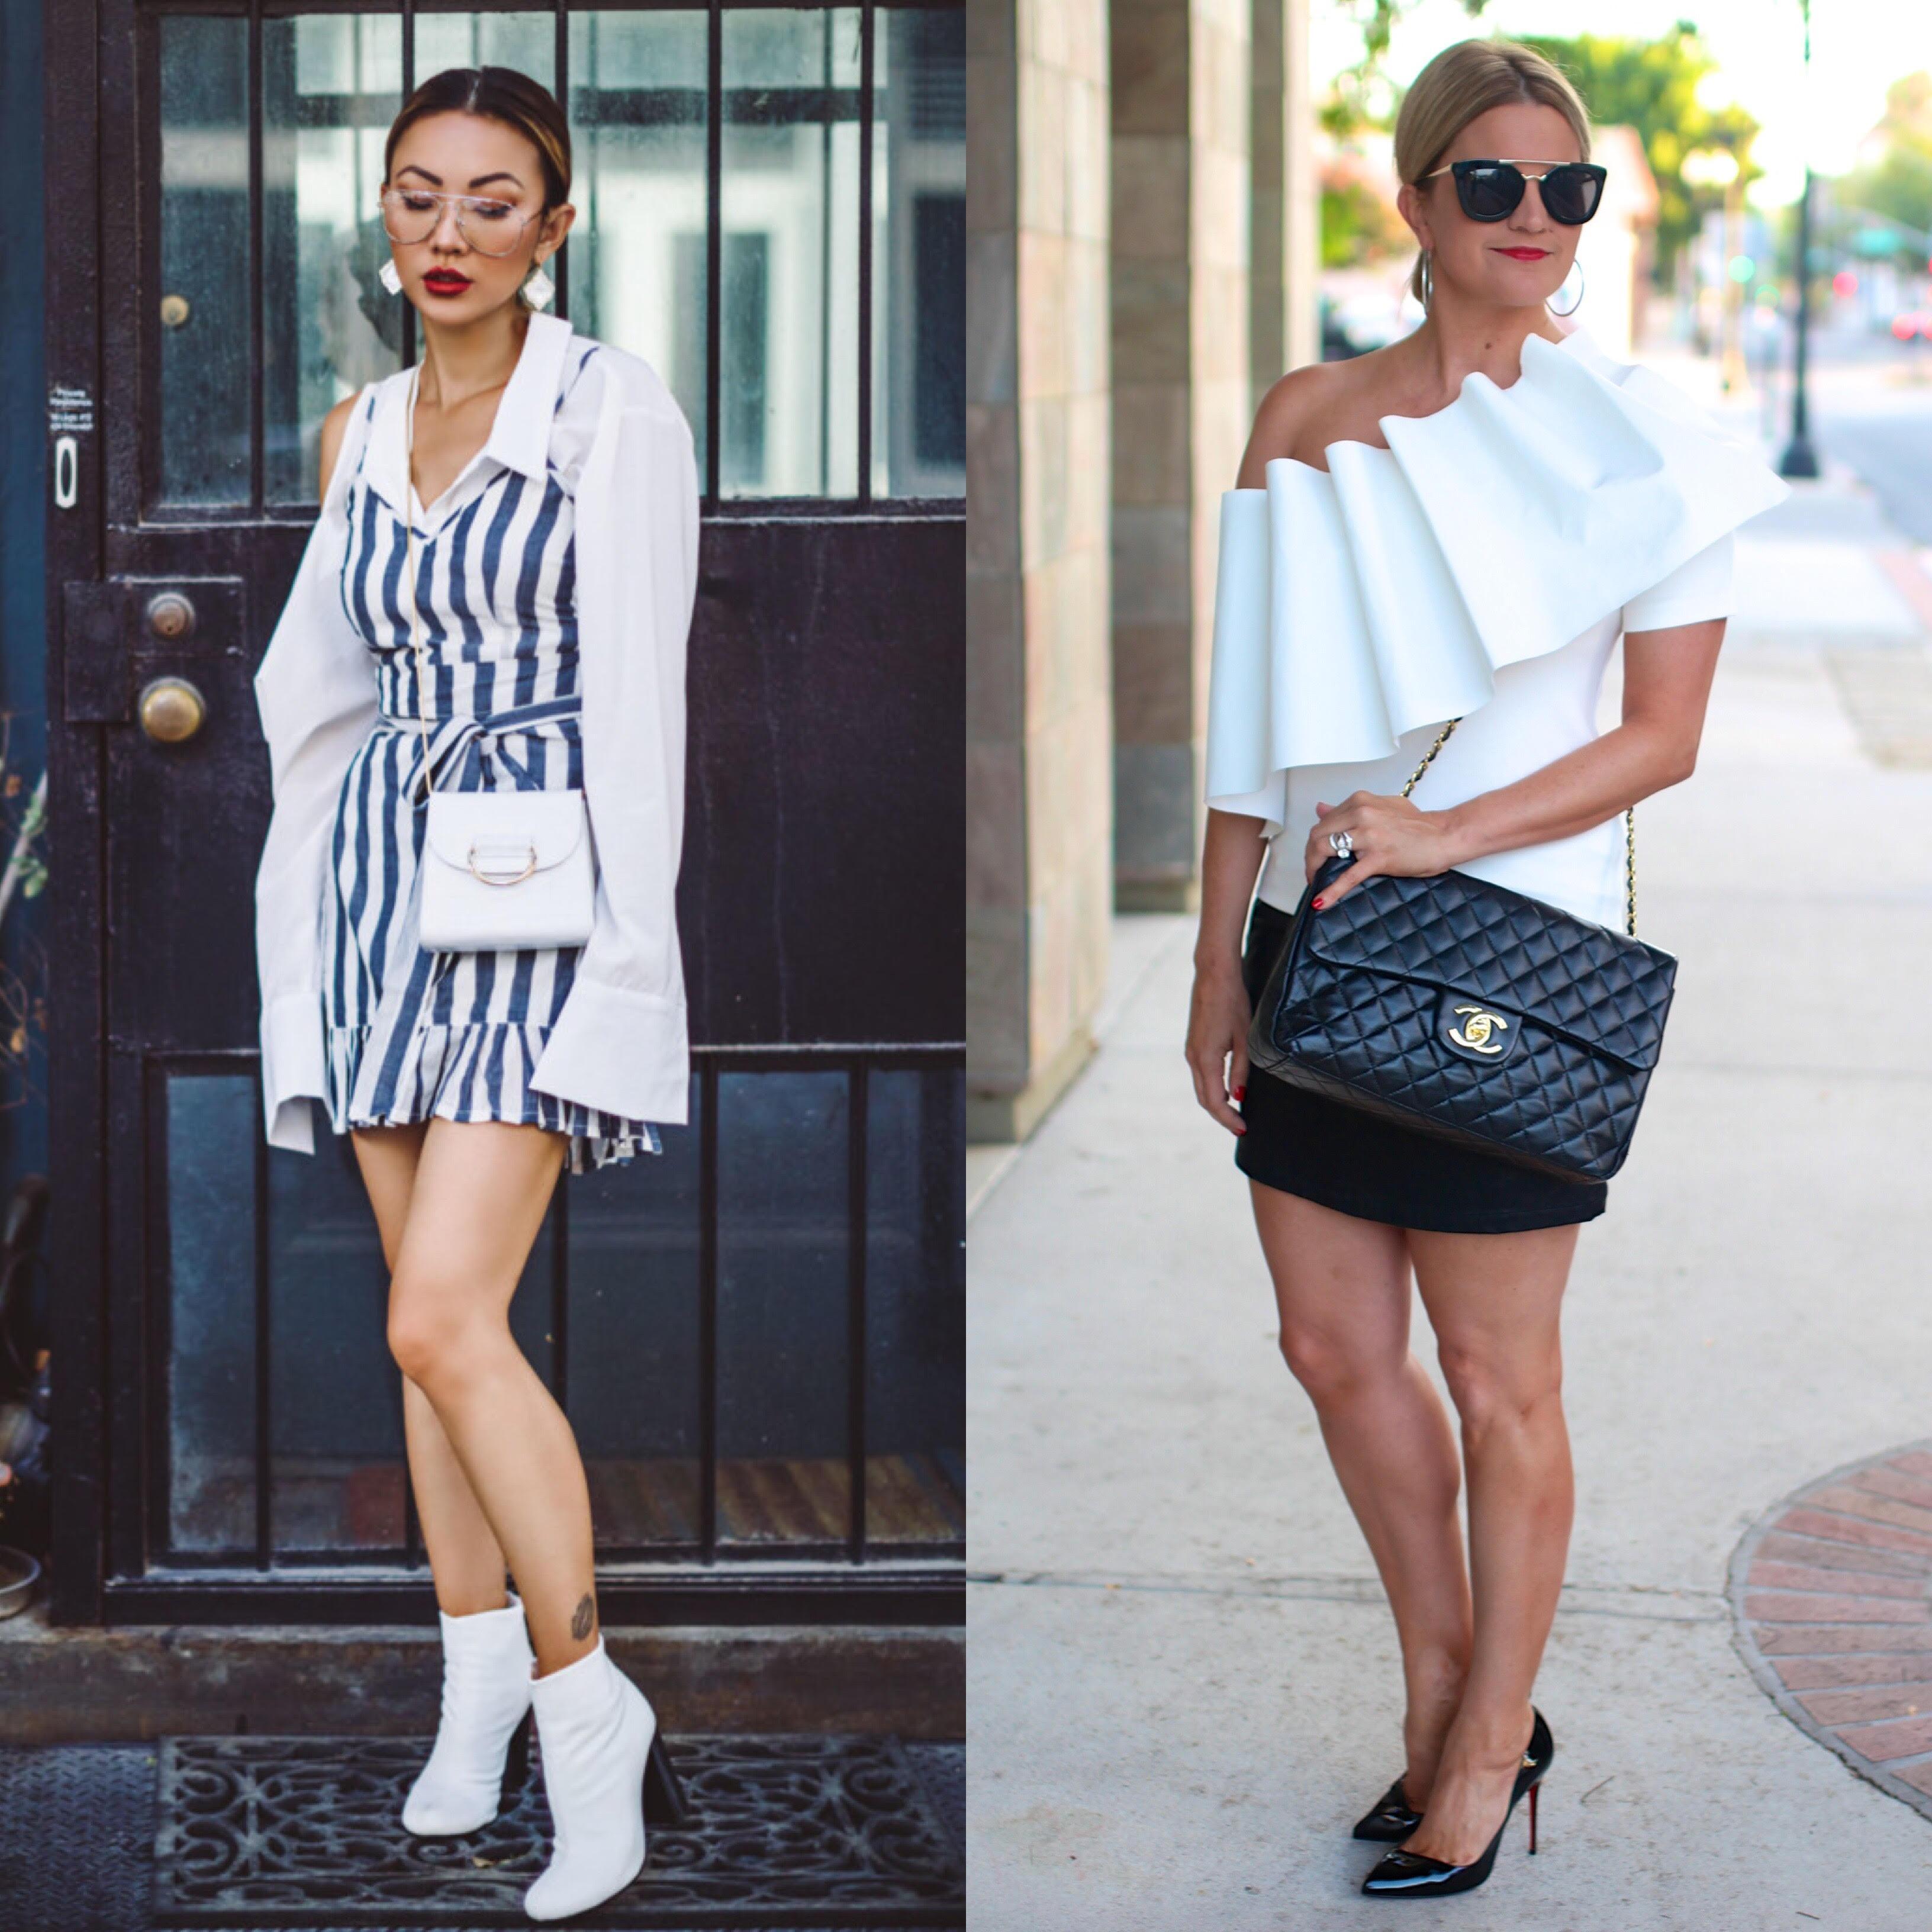 lifestyle style boggers weekly linkup